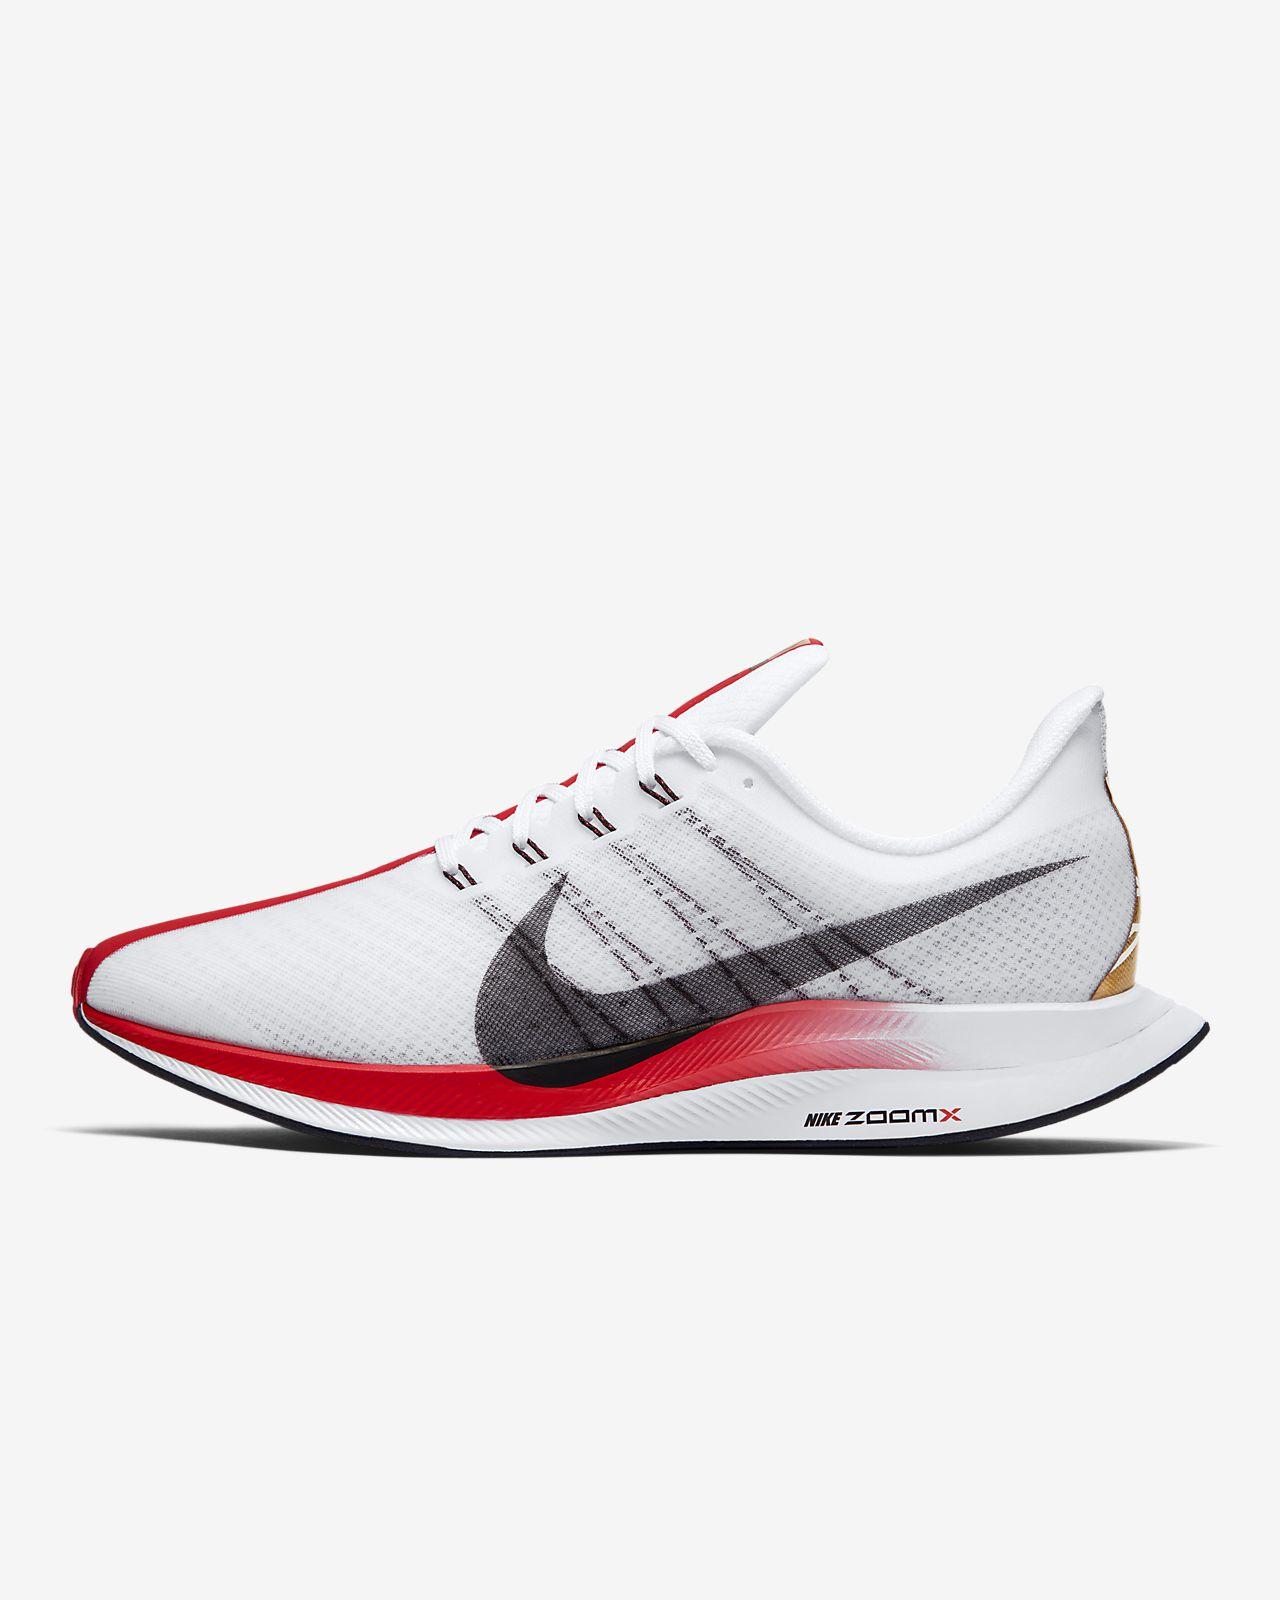 Calzado de running Nike Zoom Pegasus 35 Turbo Mo